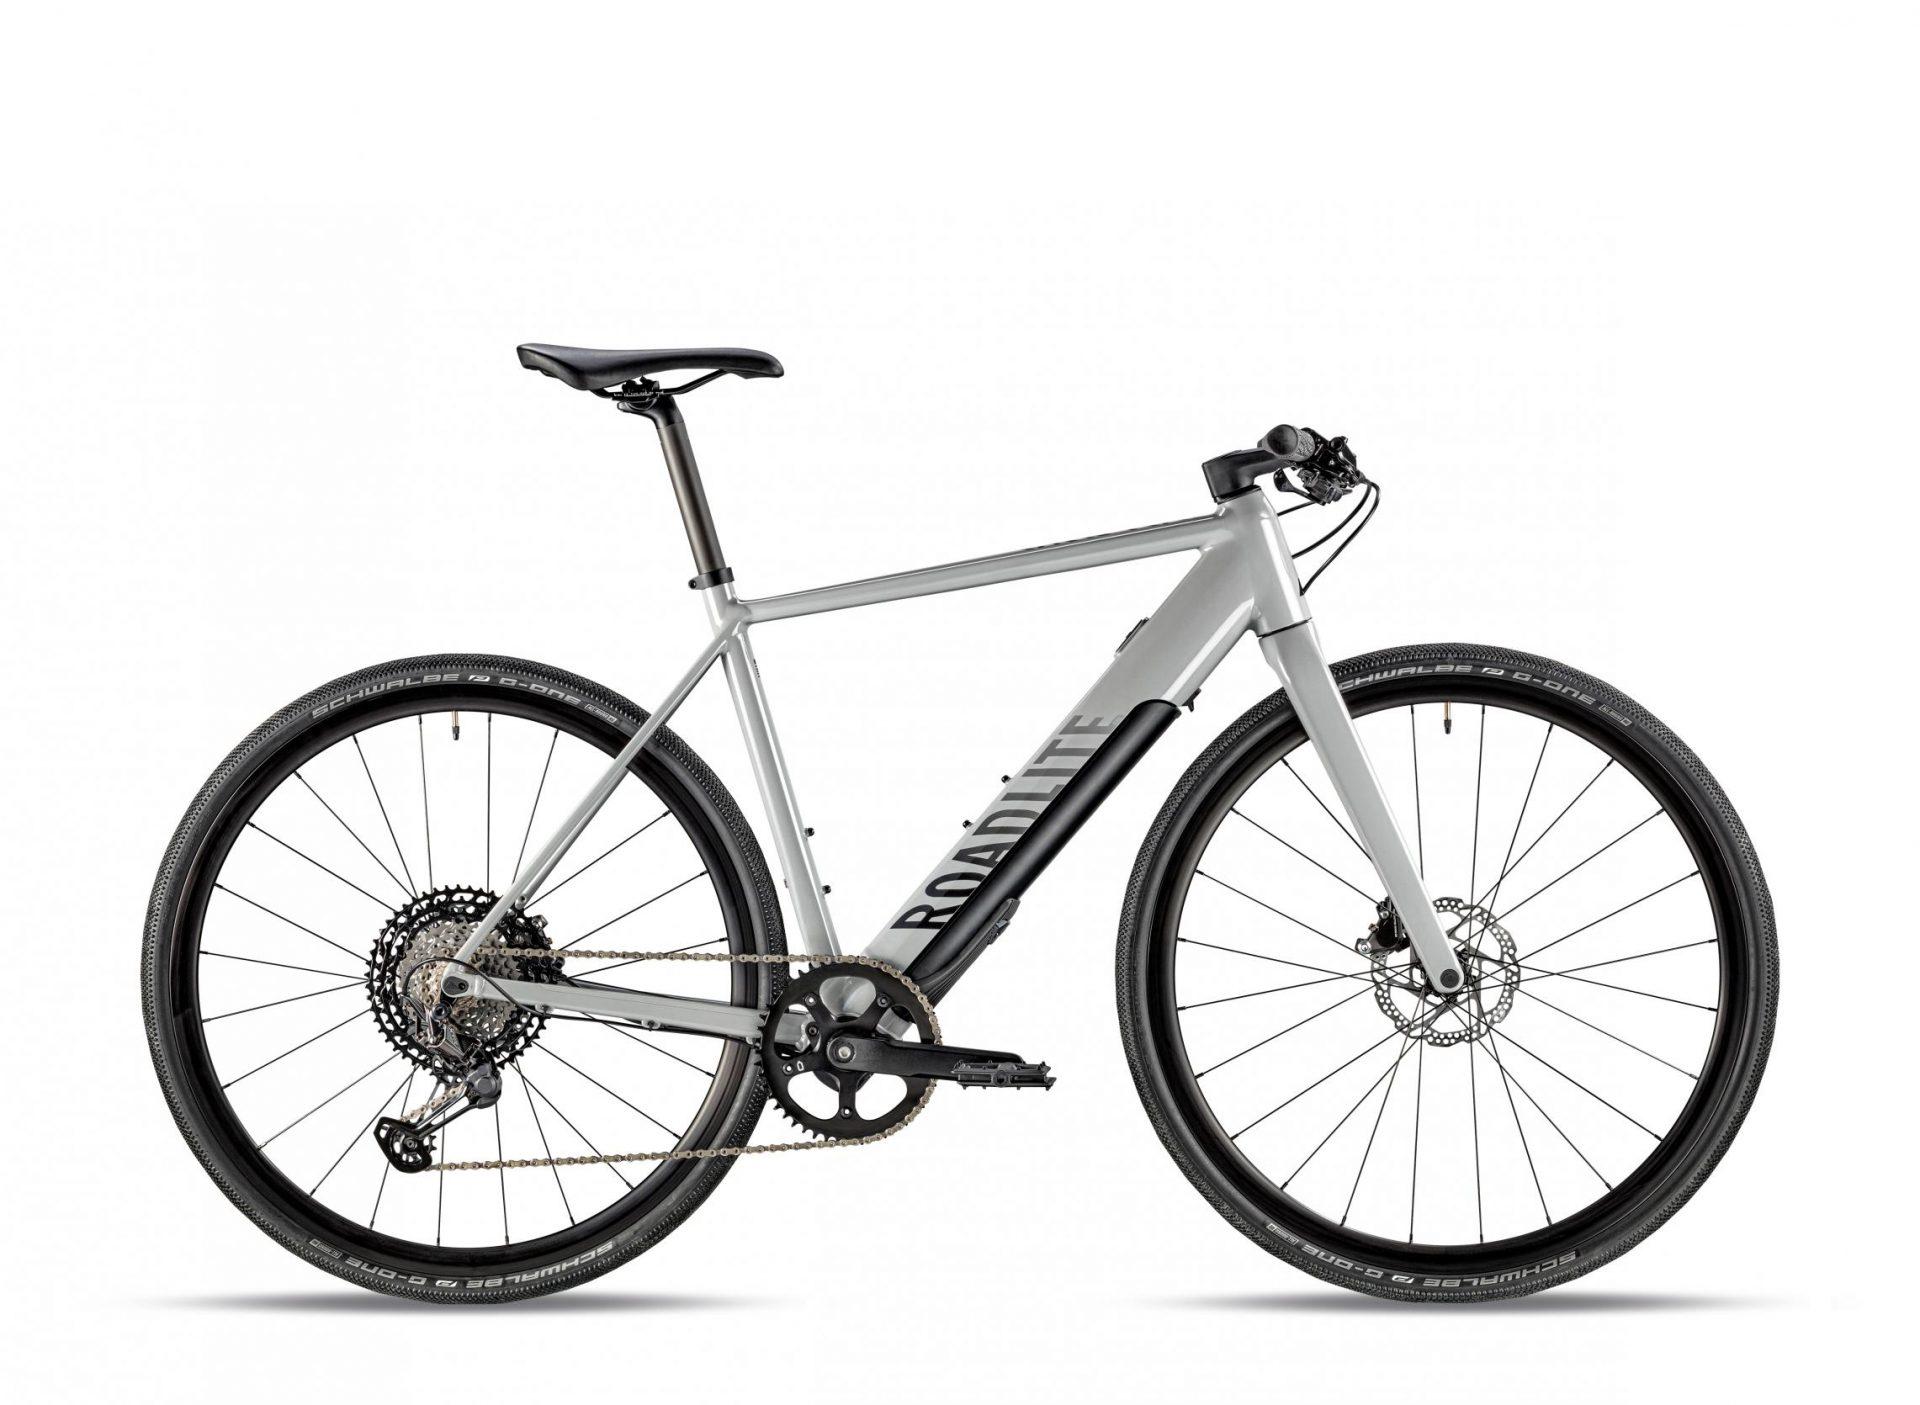 Canyon Announces New Electronic Fitness Bike Roadlite:ON 3